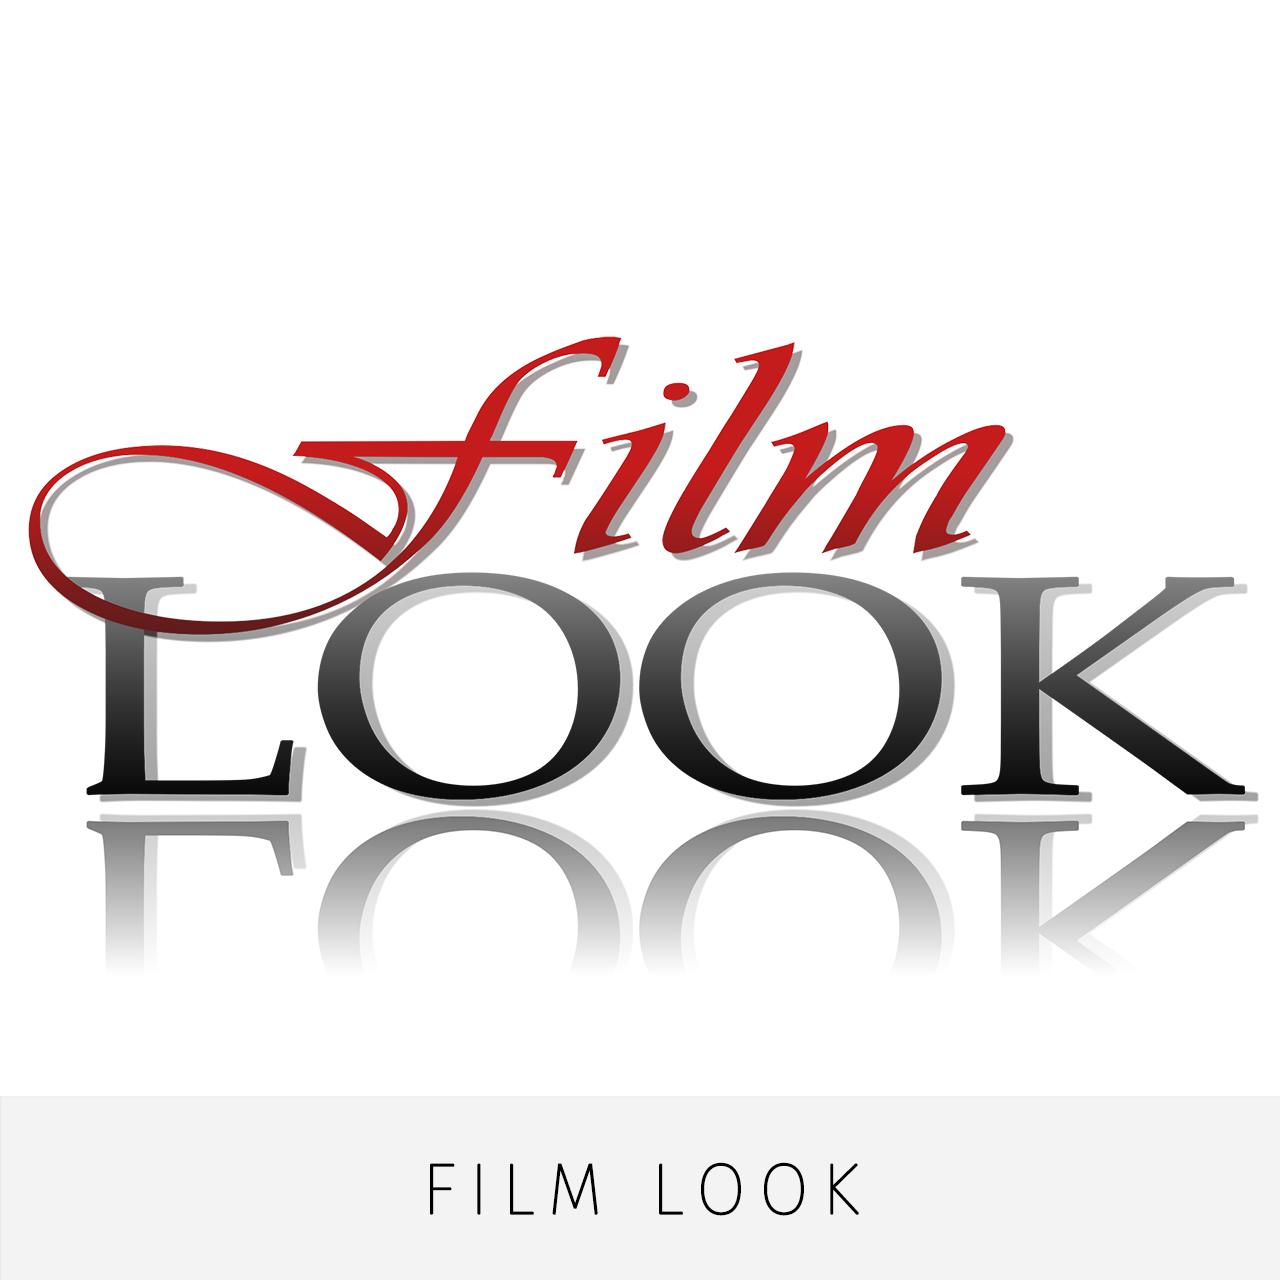 http://filmlook.pl